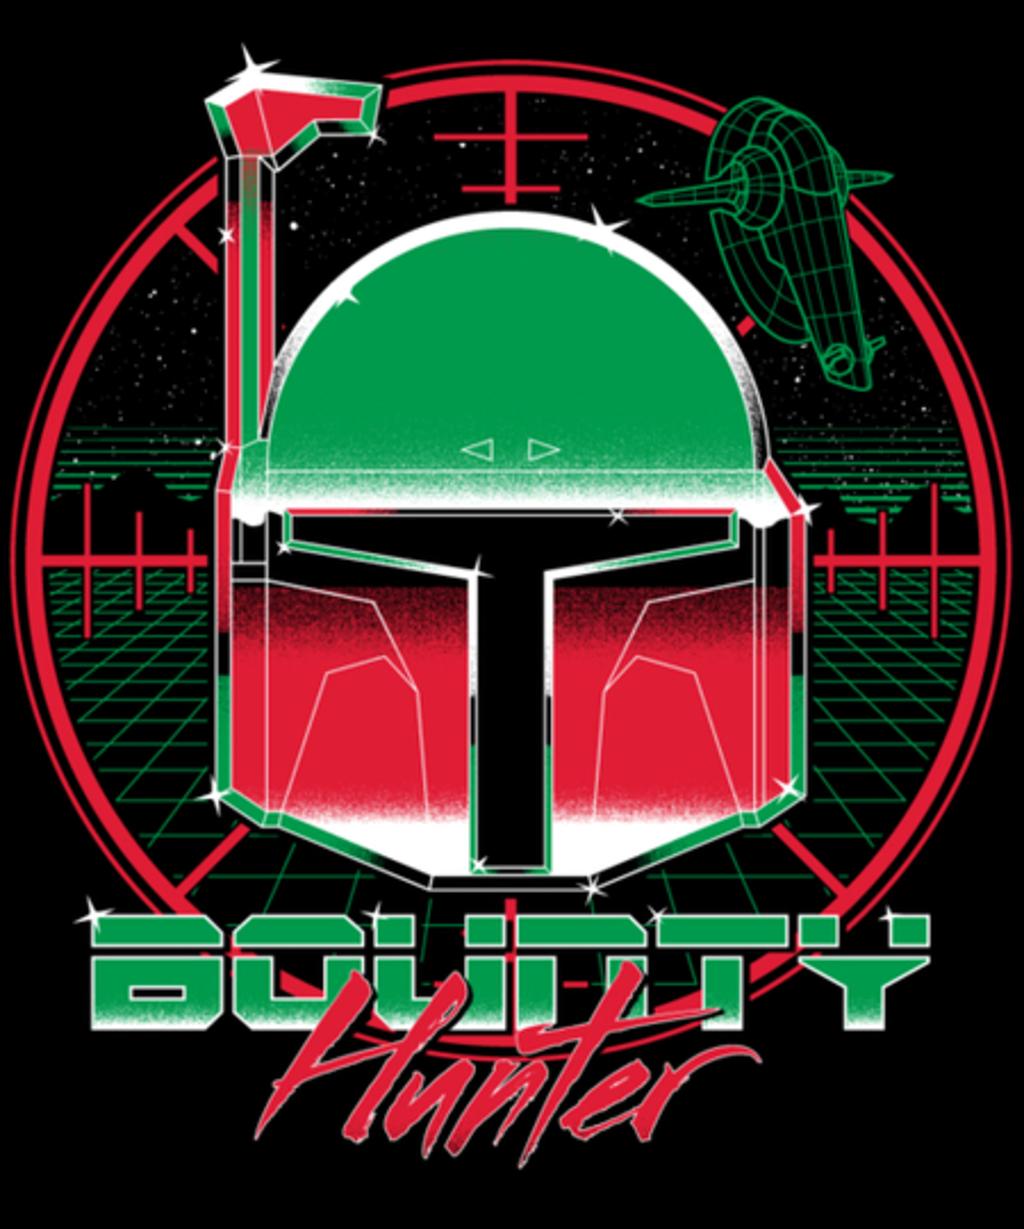 Qwertee: Bounty Hunter